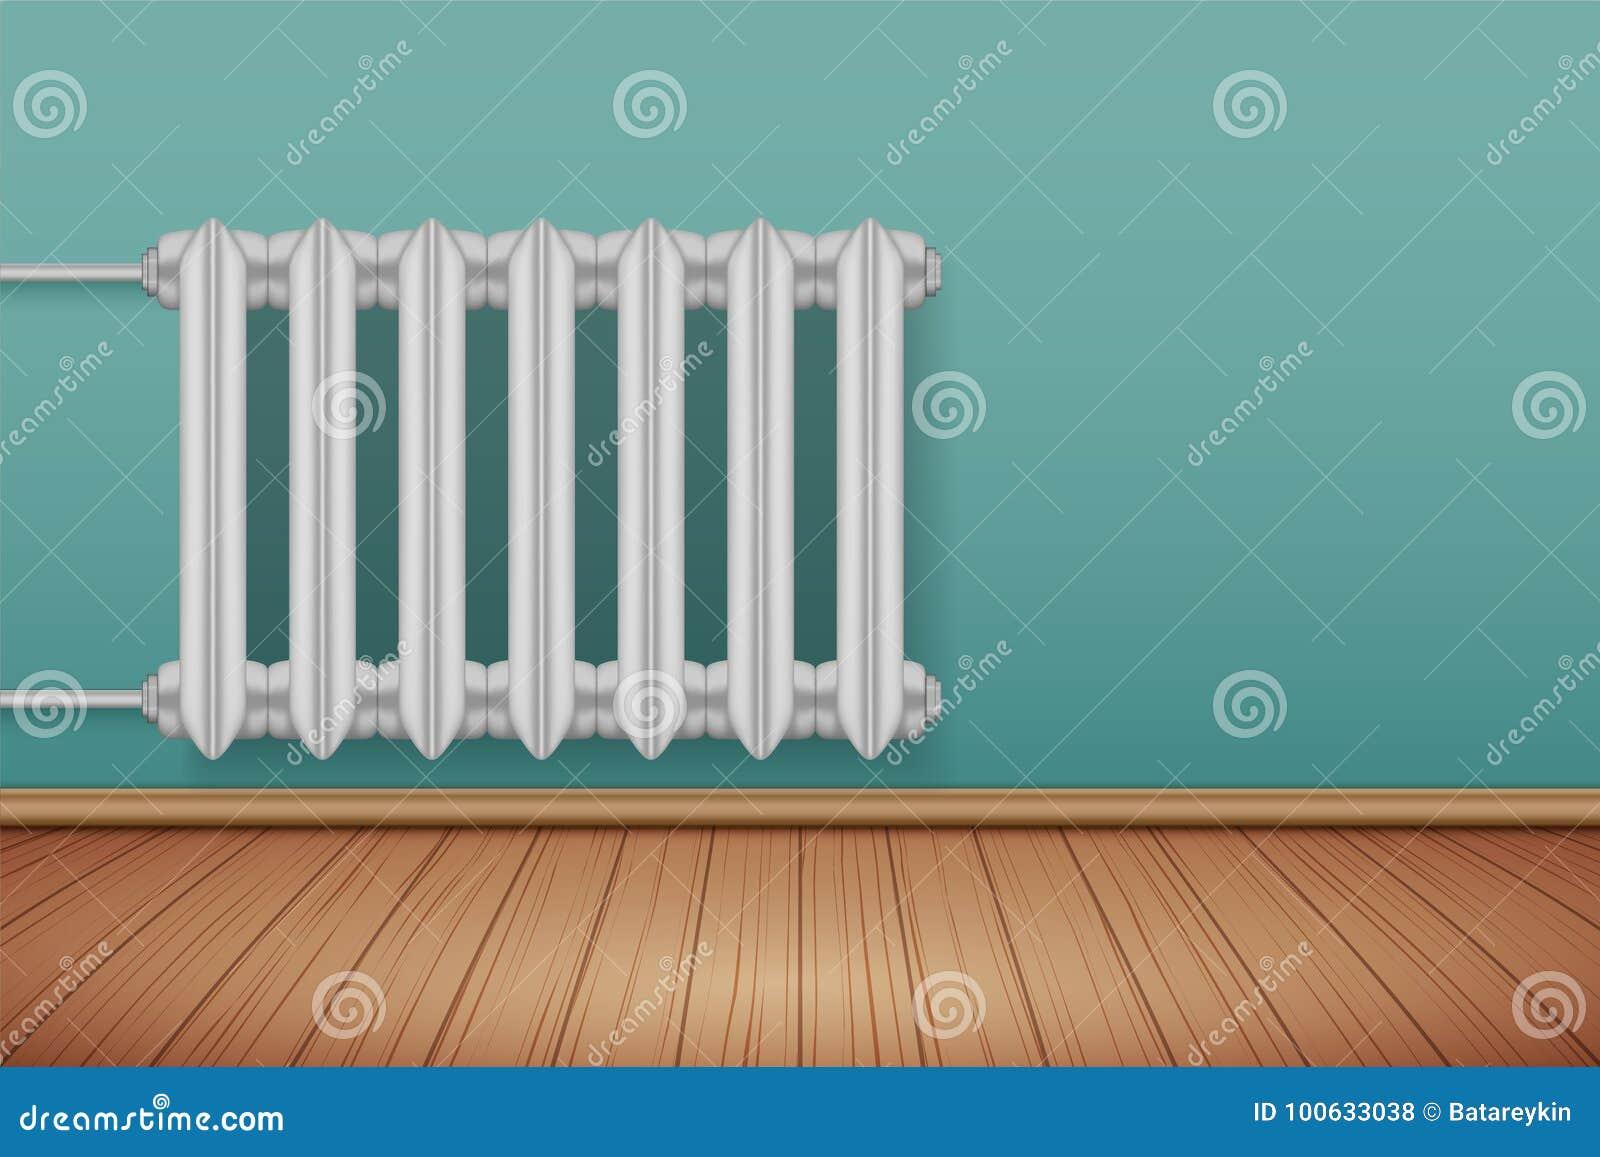 Vintage Metal Heating Radiator In Room Stock Vector - Illustration ...